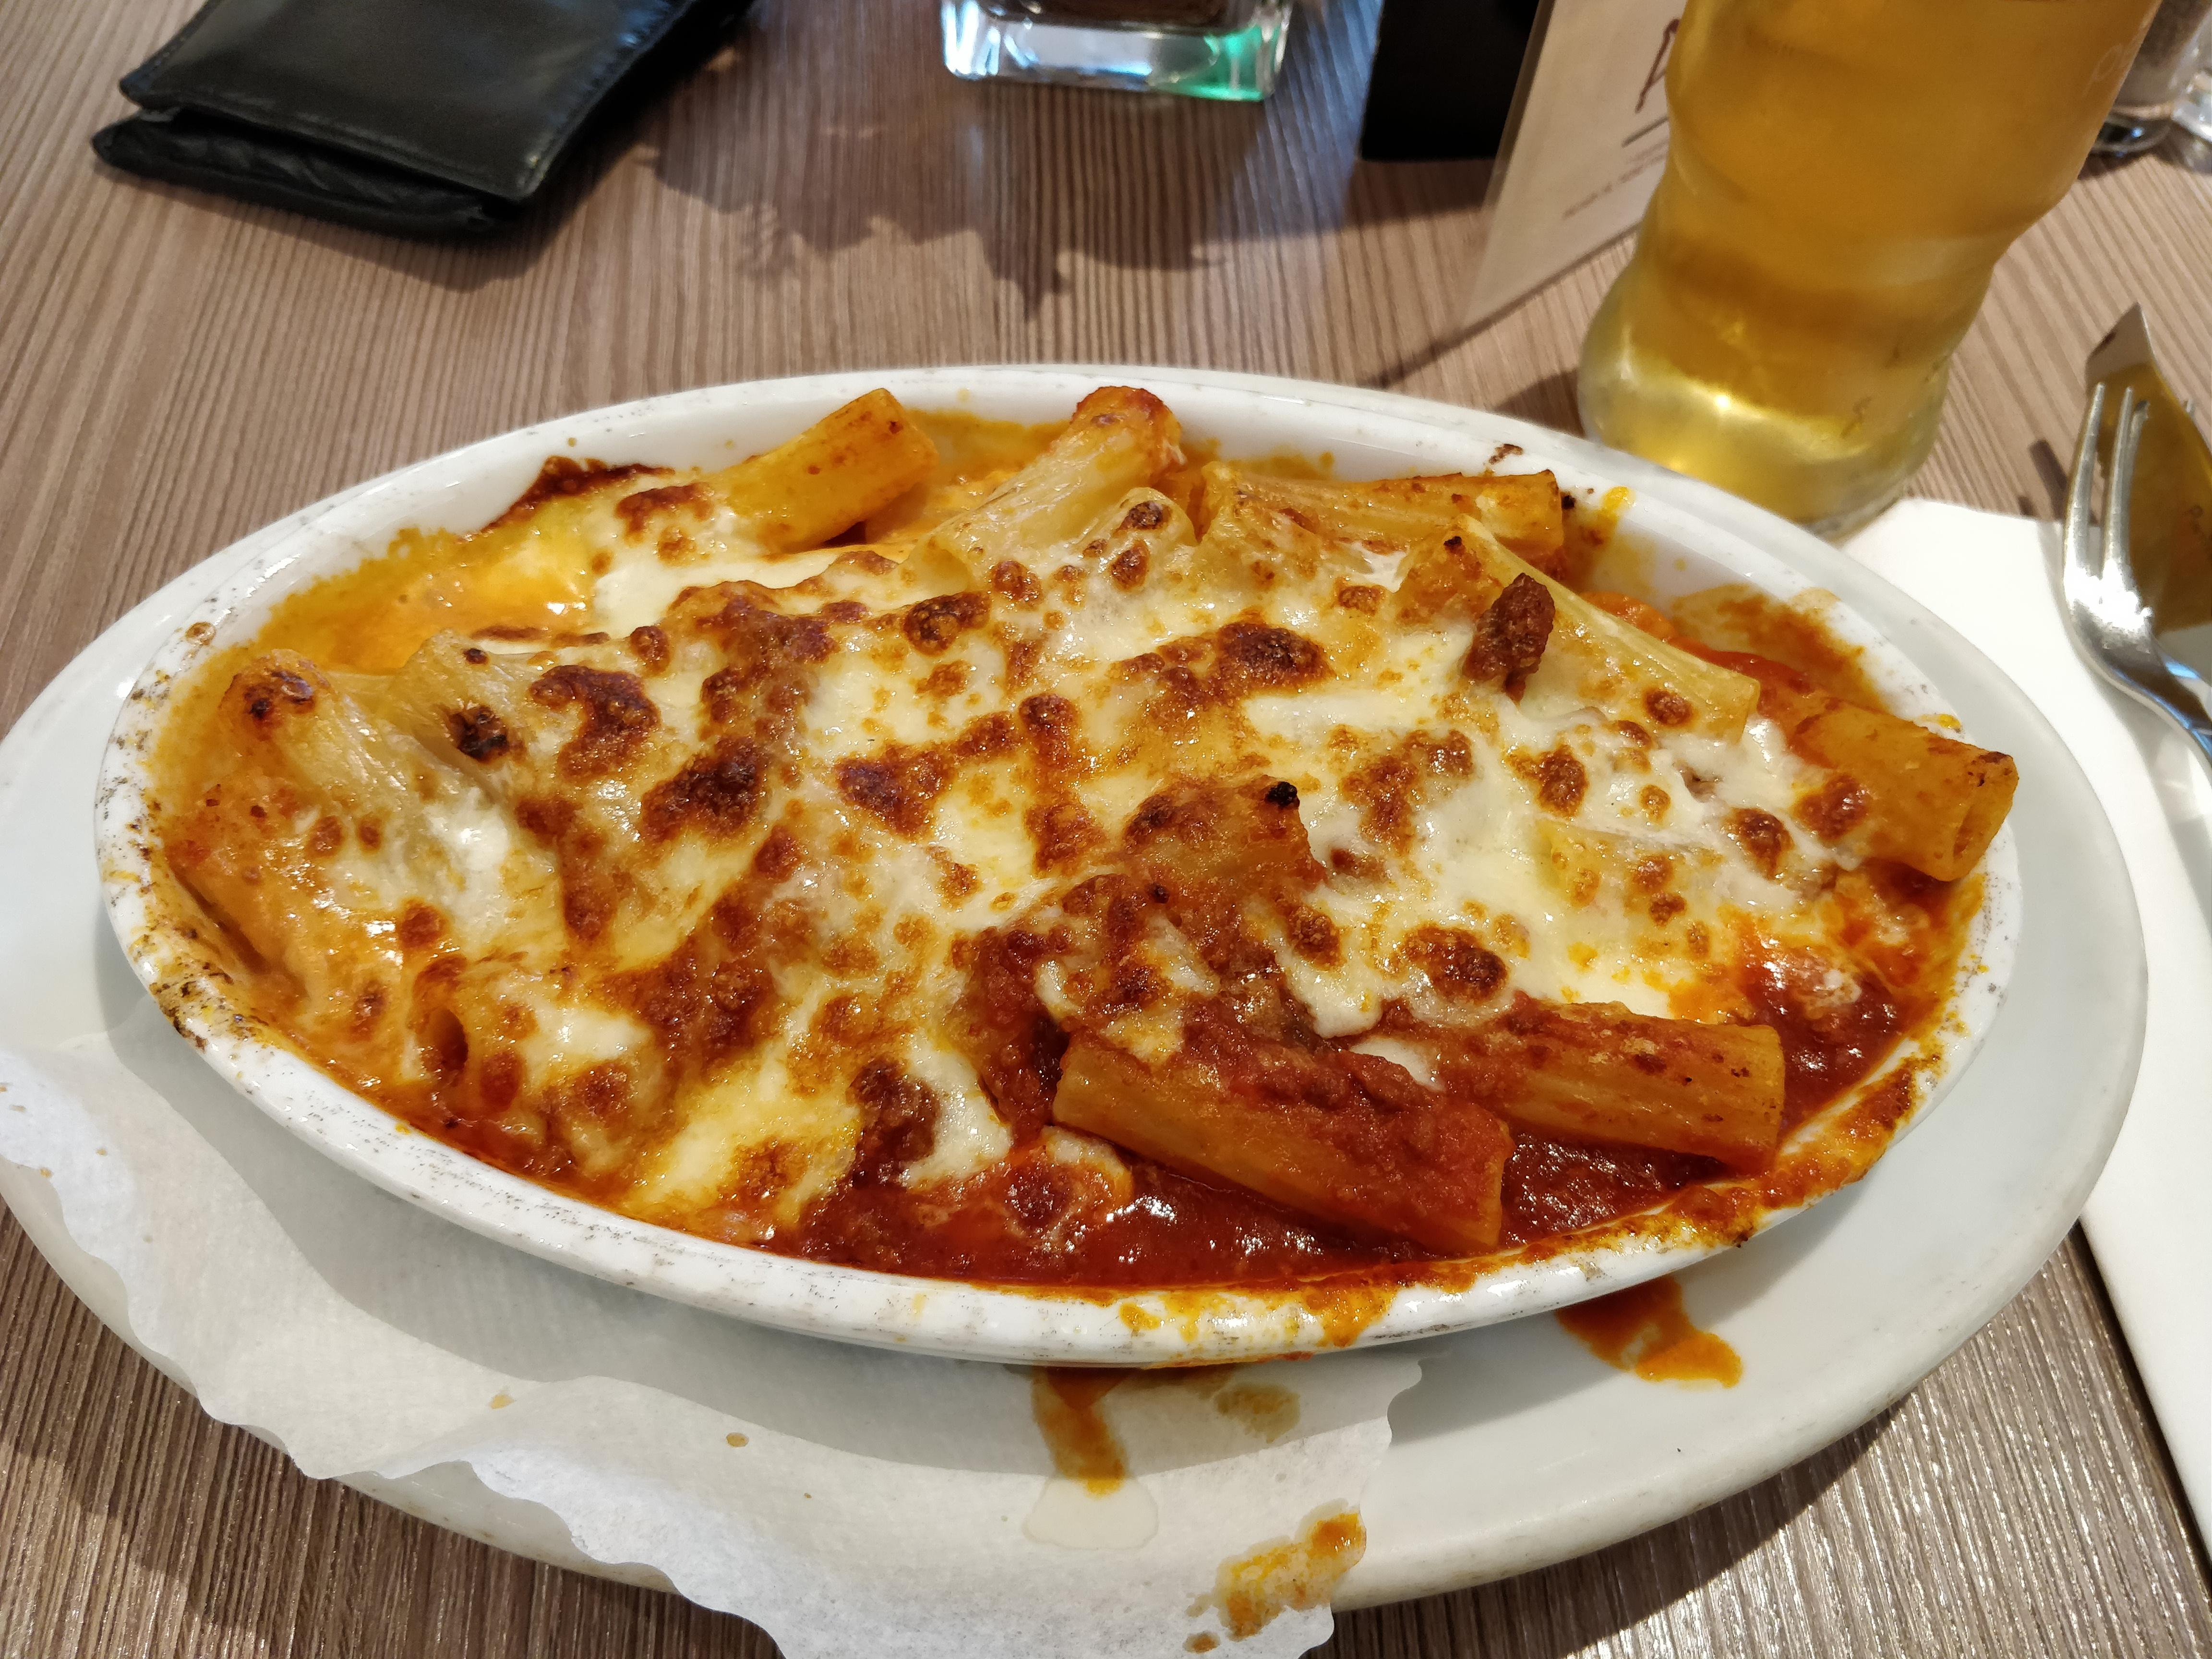 http://foodloader.net/nico_2018-10-13_rigatoni-al-forno.jpg